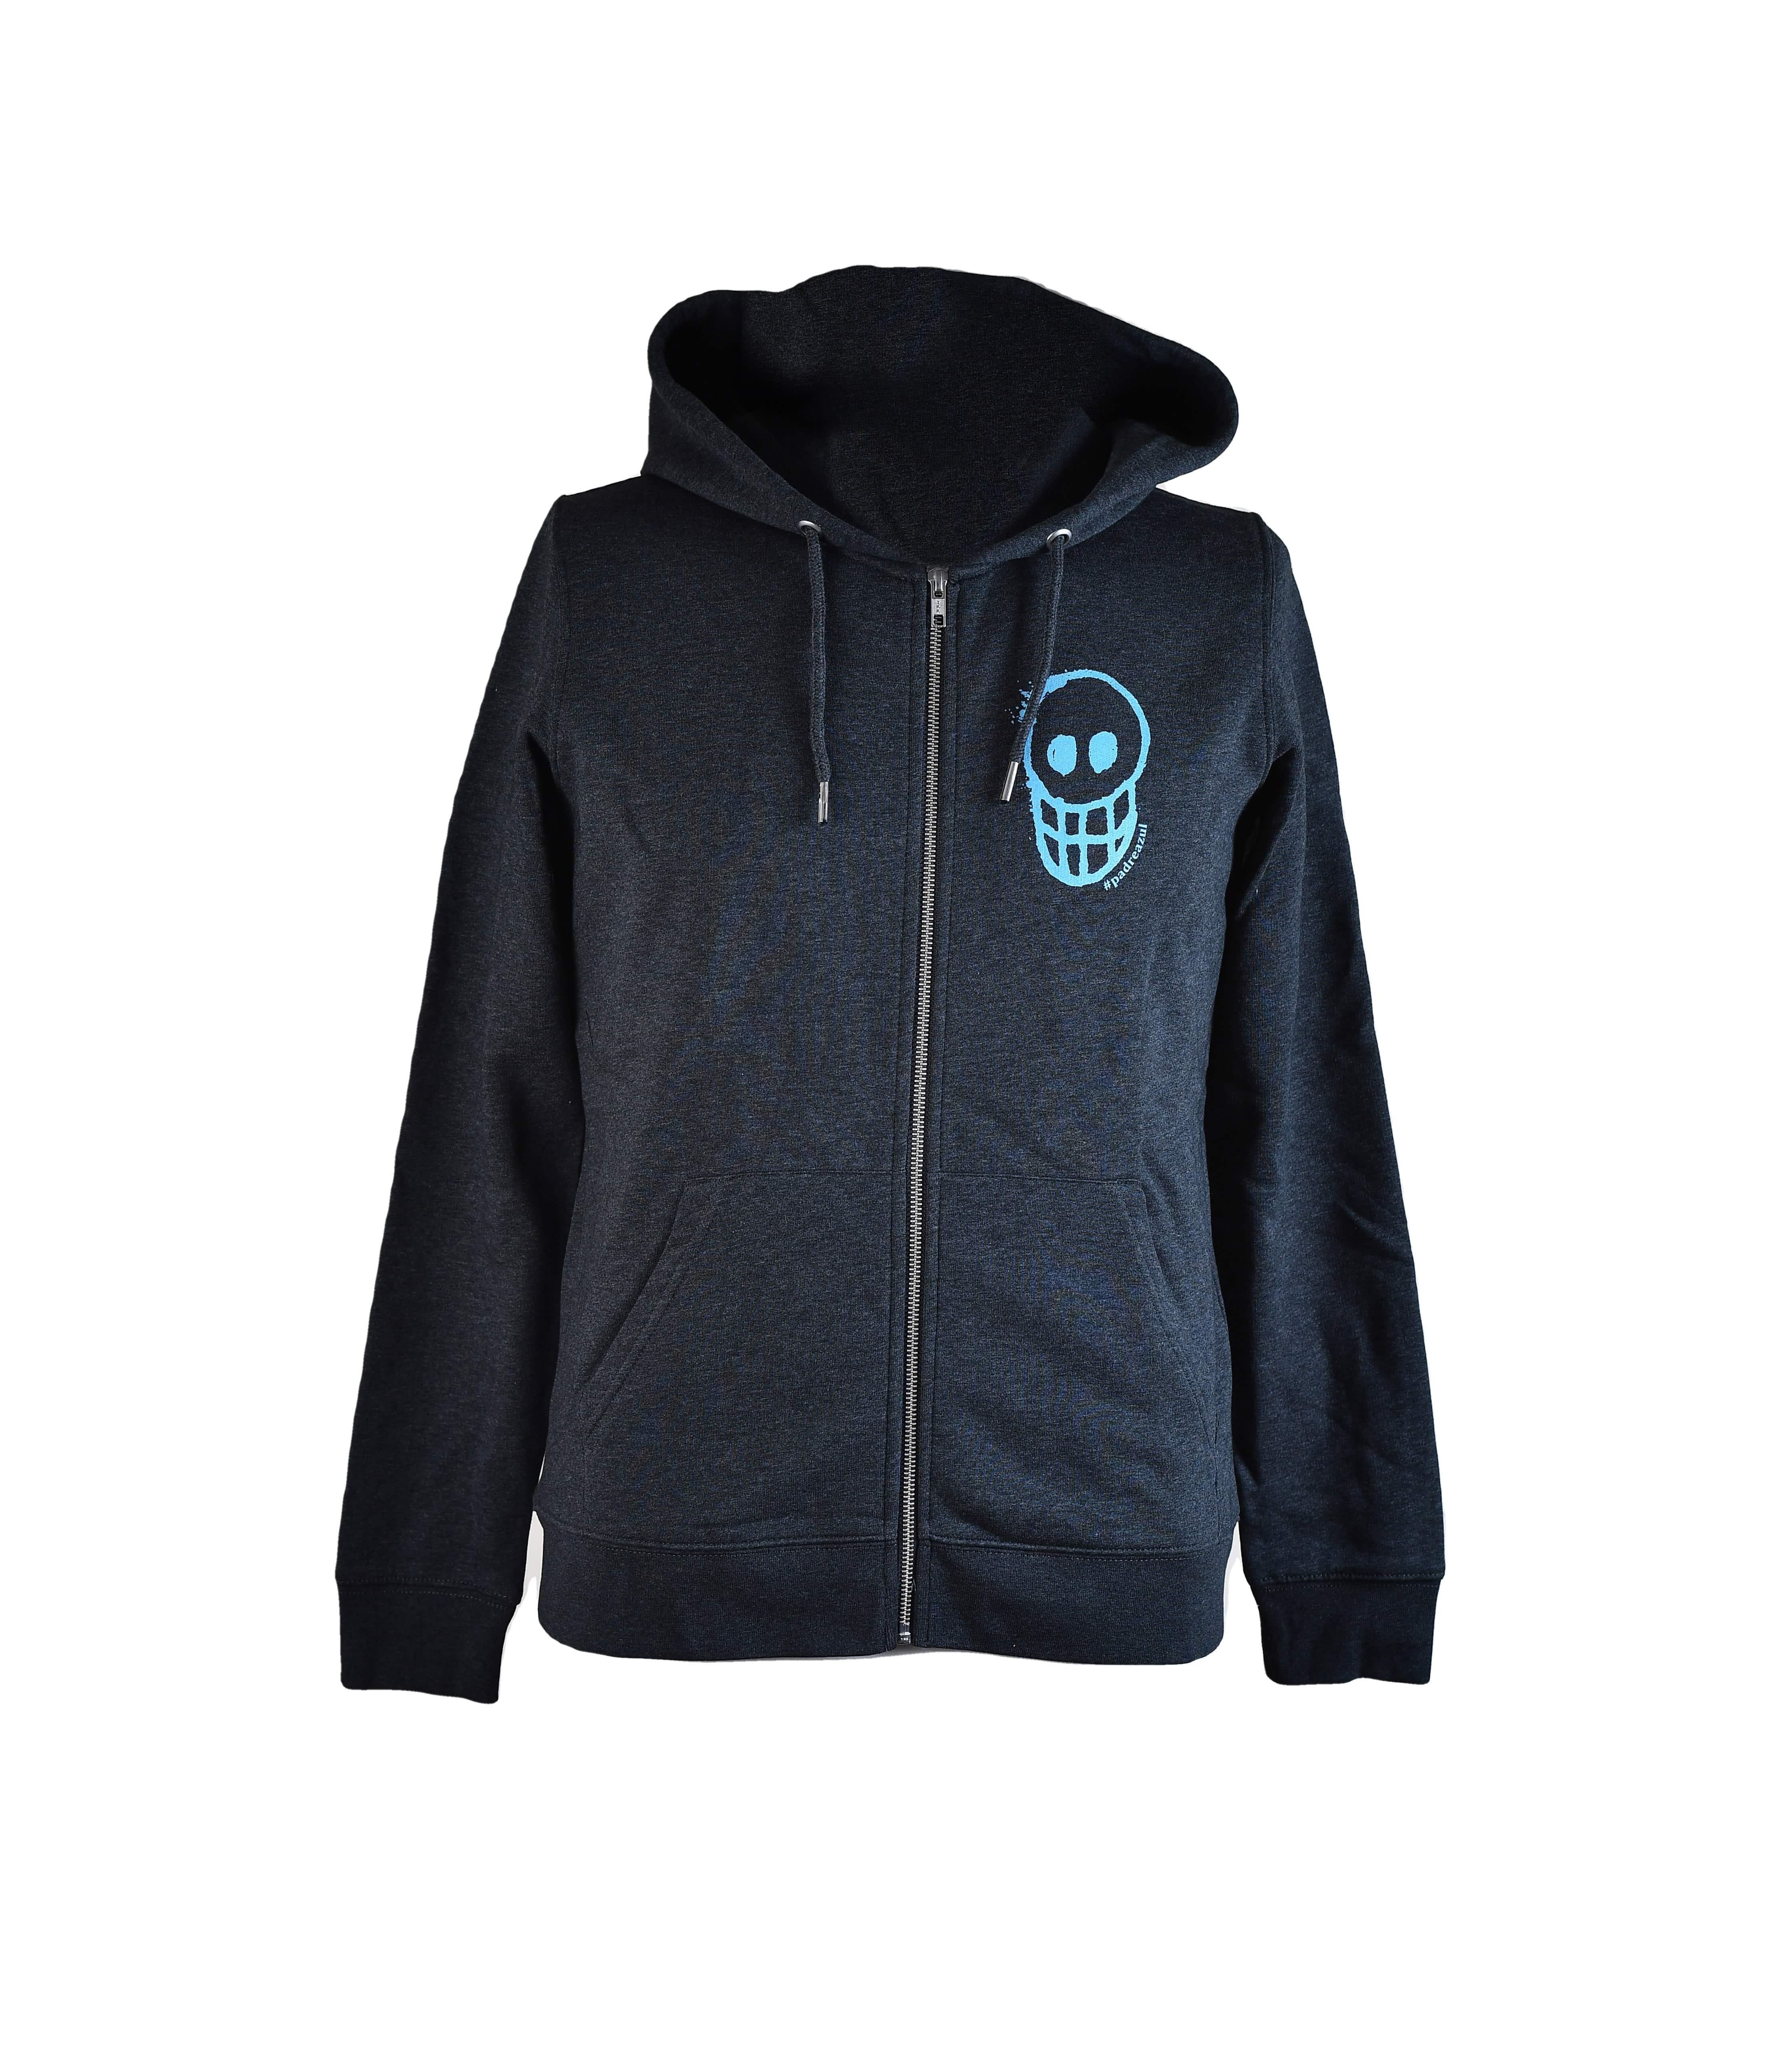 Ramon hoodie with zipper